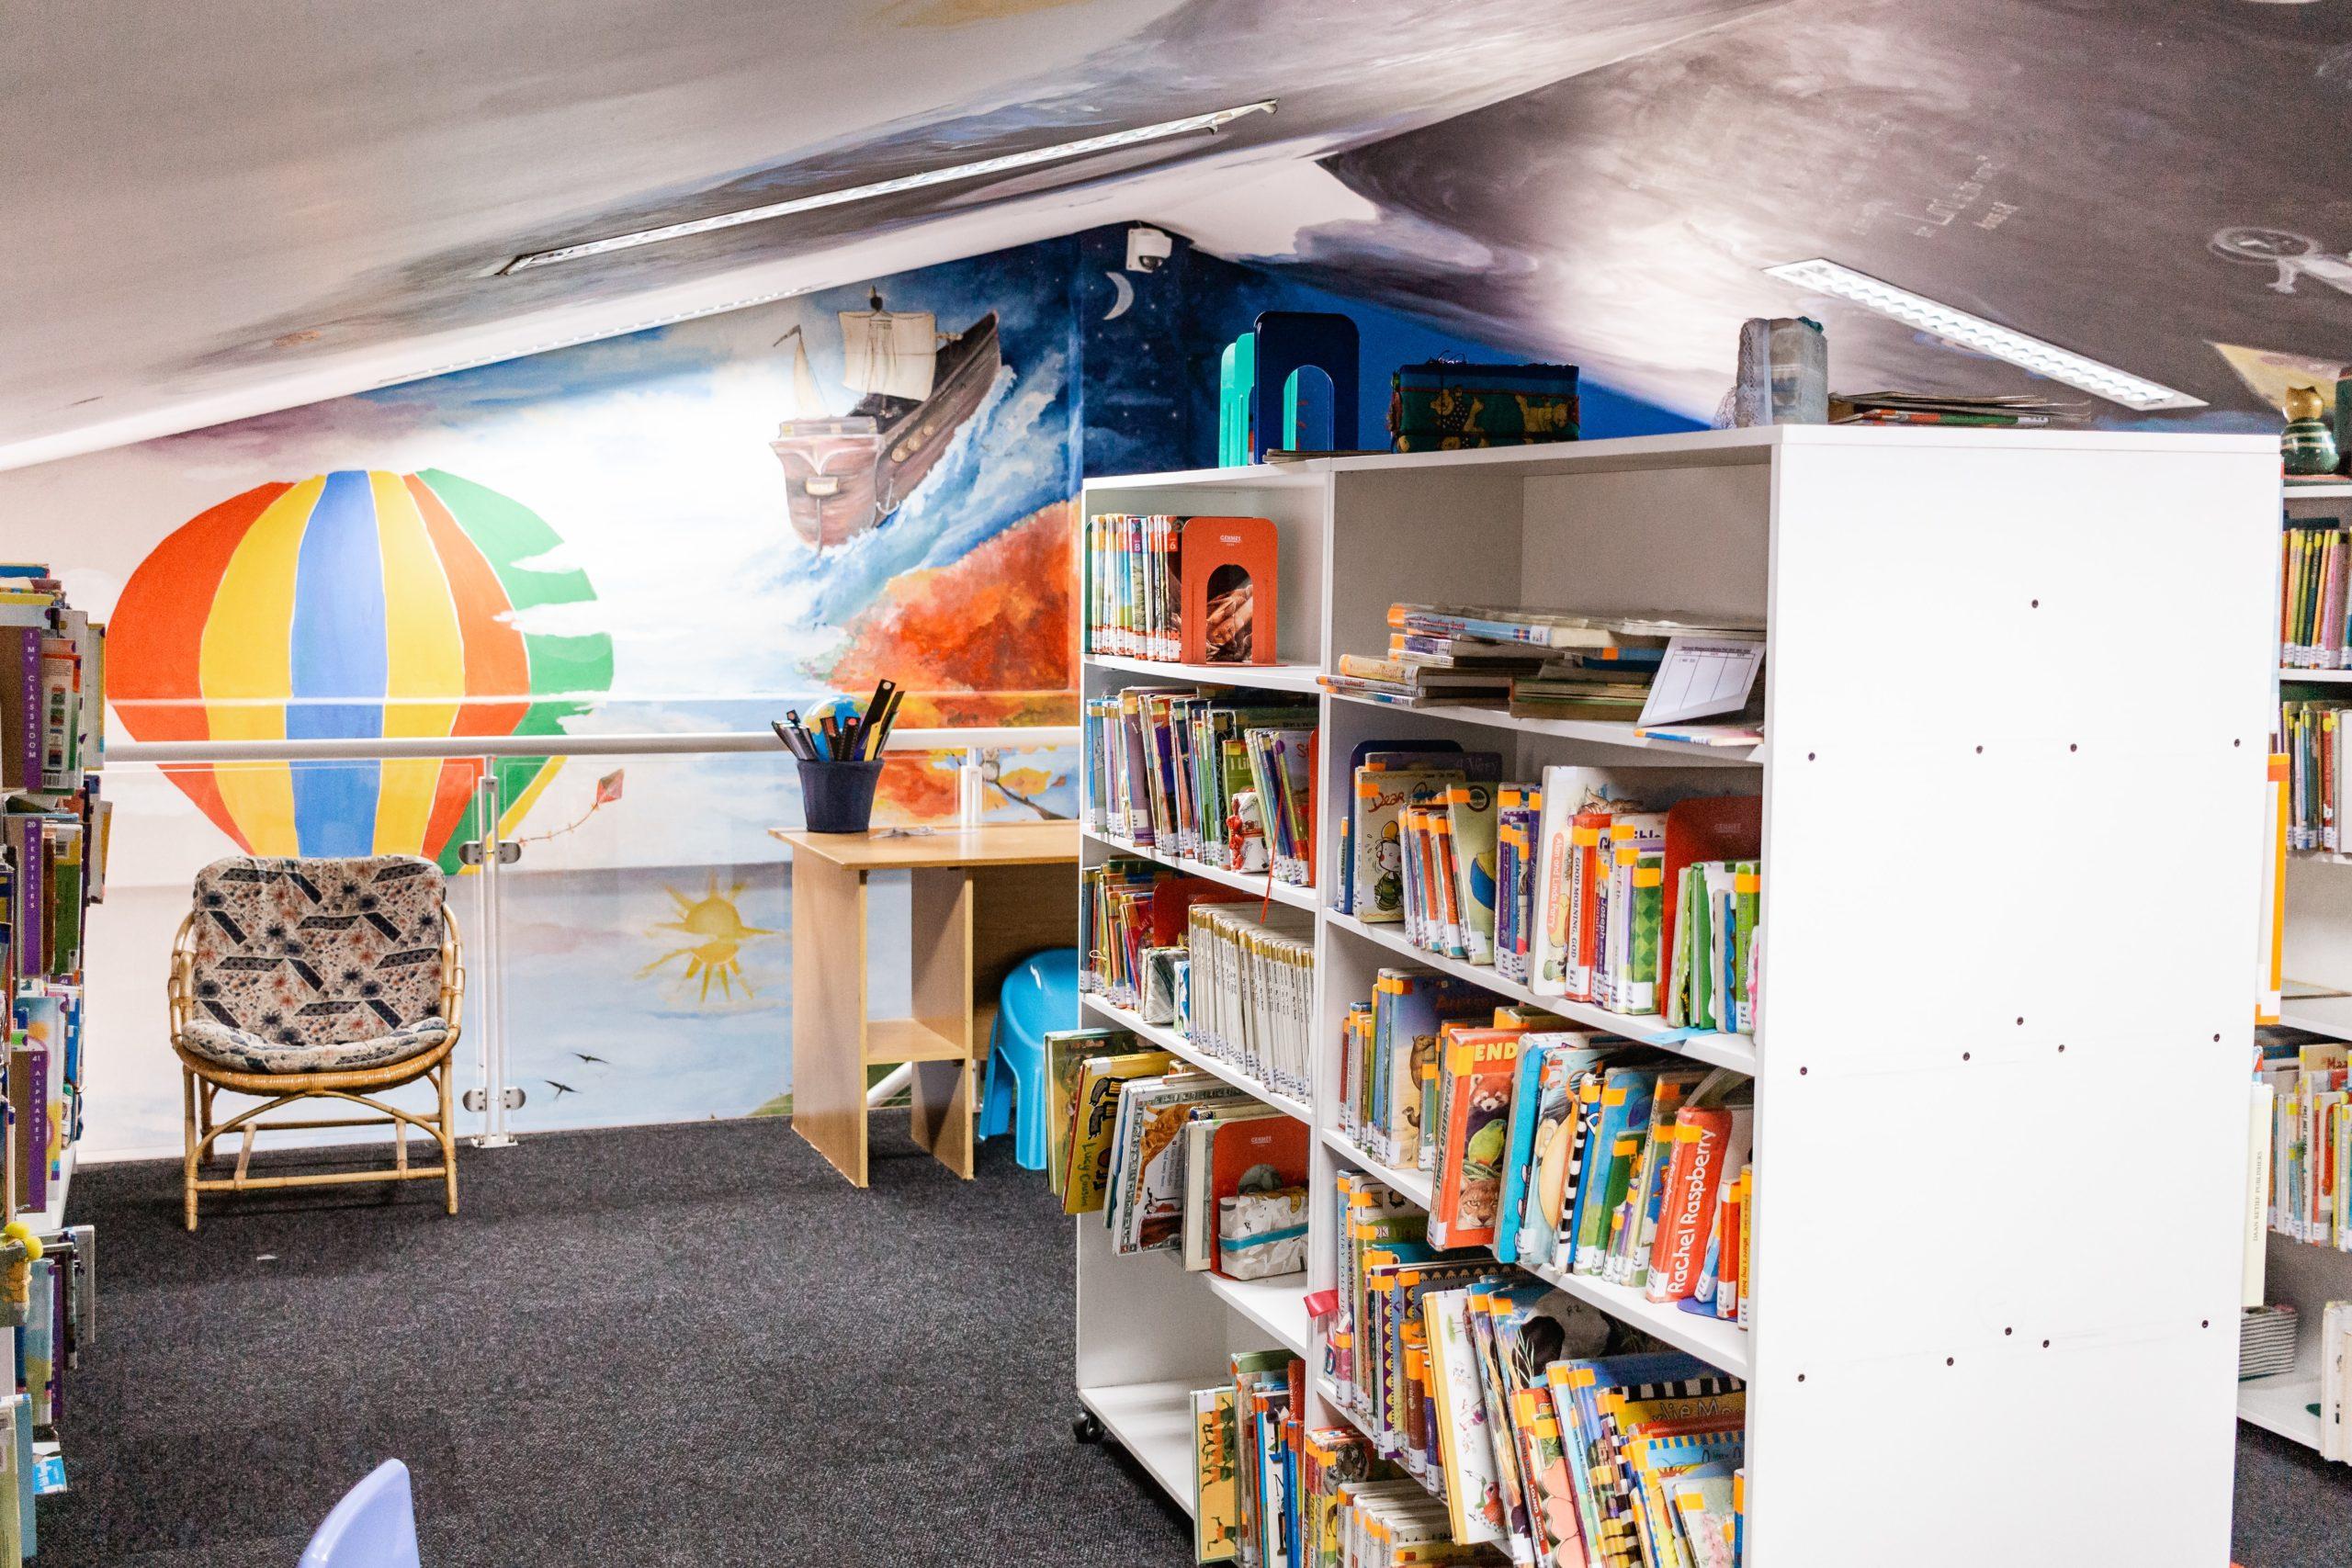 actividades_animacion_lectura_bibliotecas_mjasensio